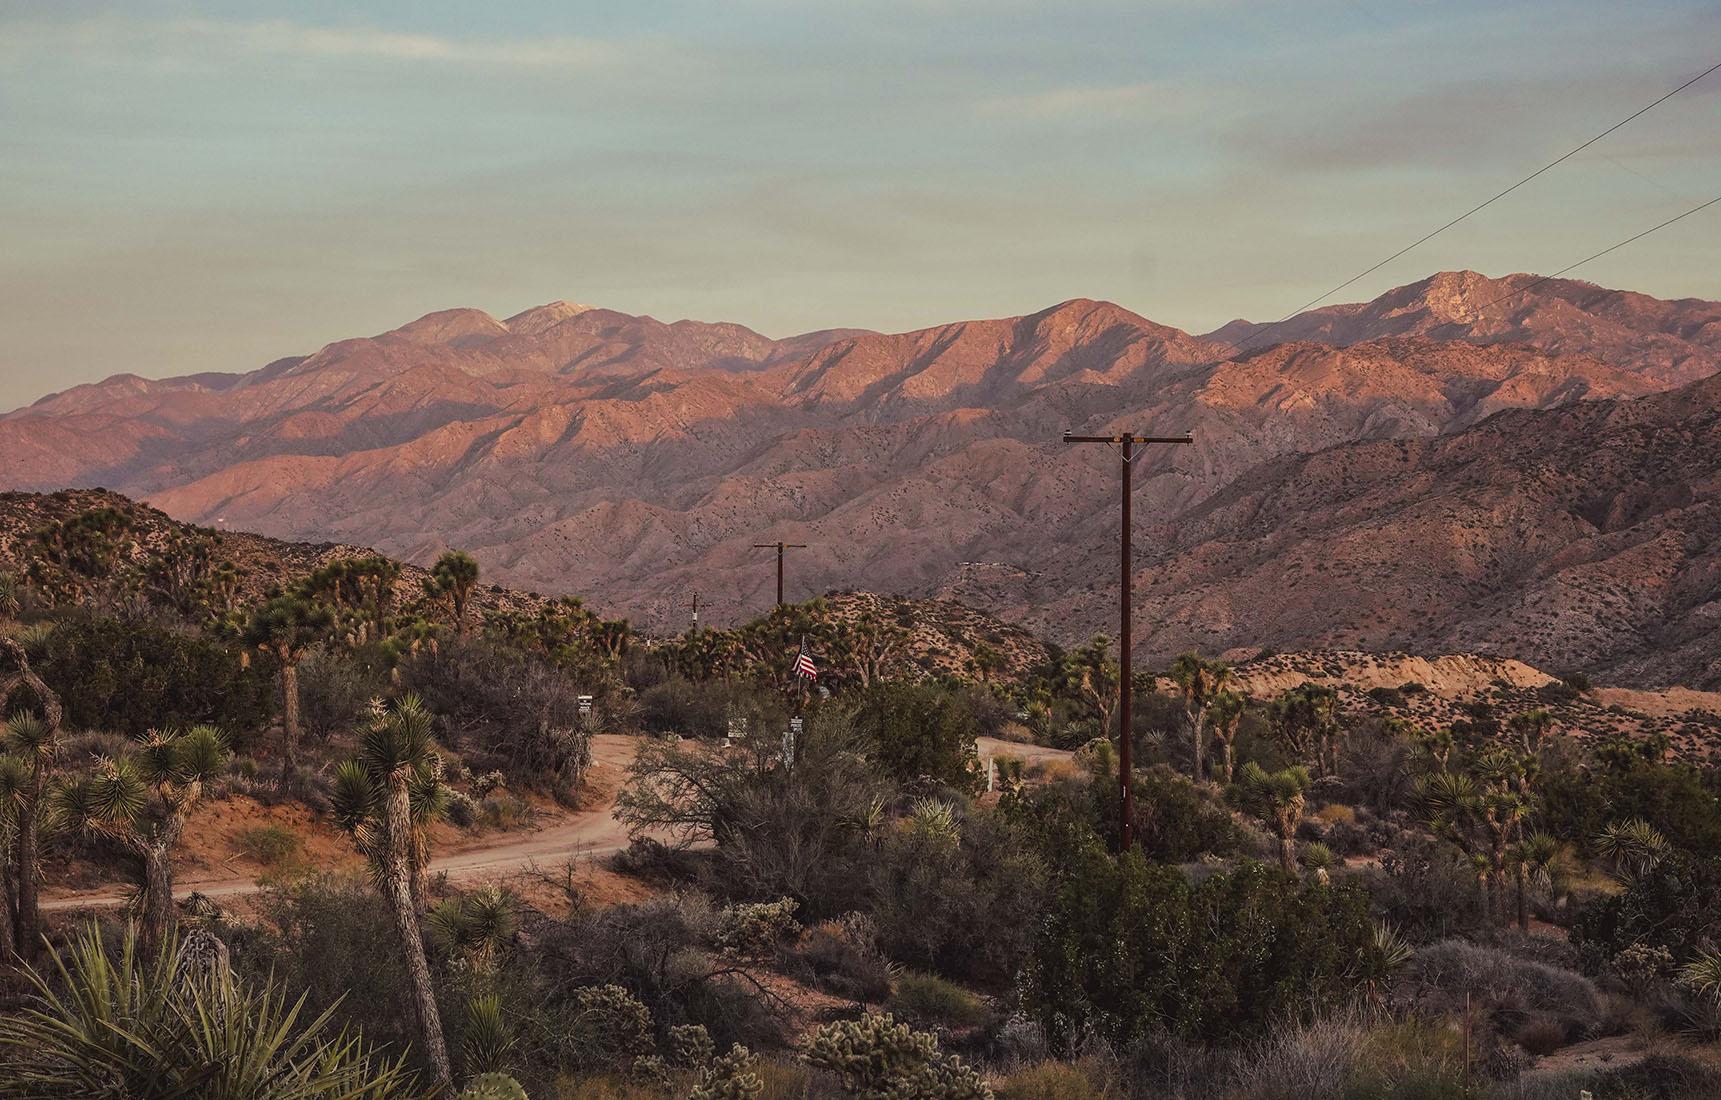 Joshua Tree National Park California Road Trip USA Airbnb Airstream camping Yucca Valley